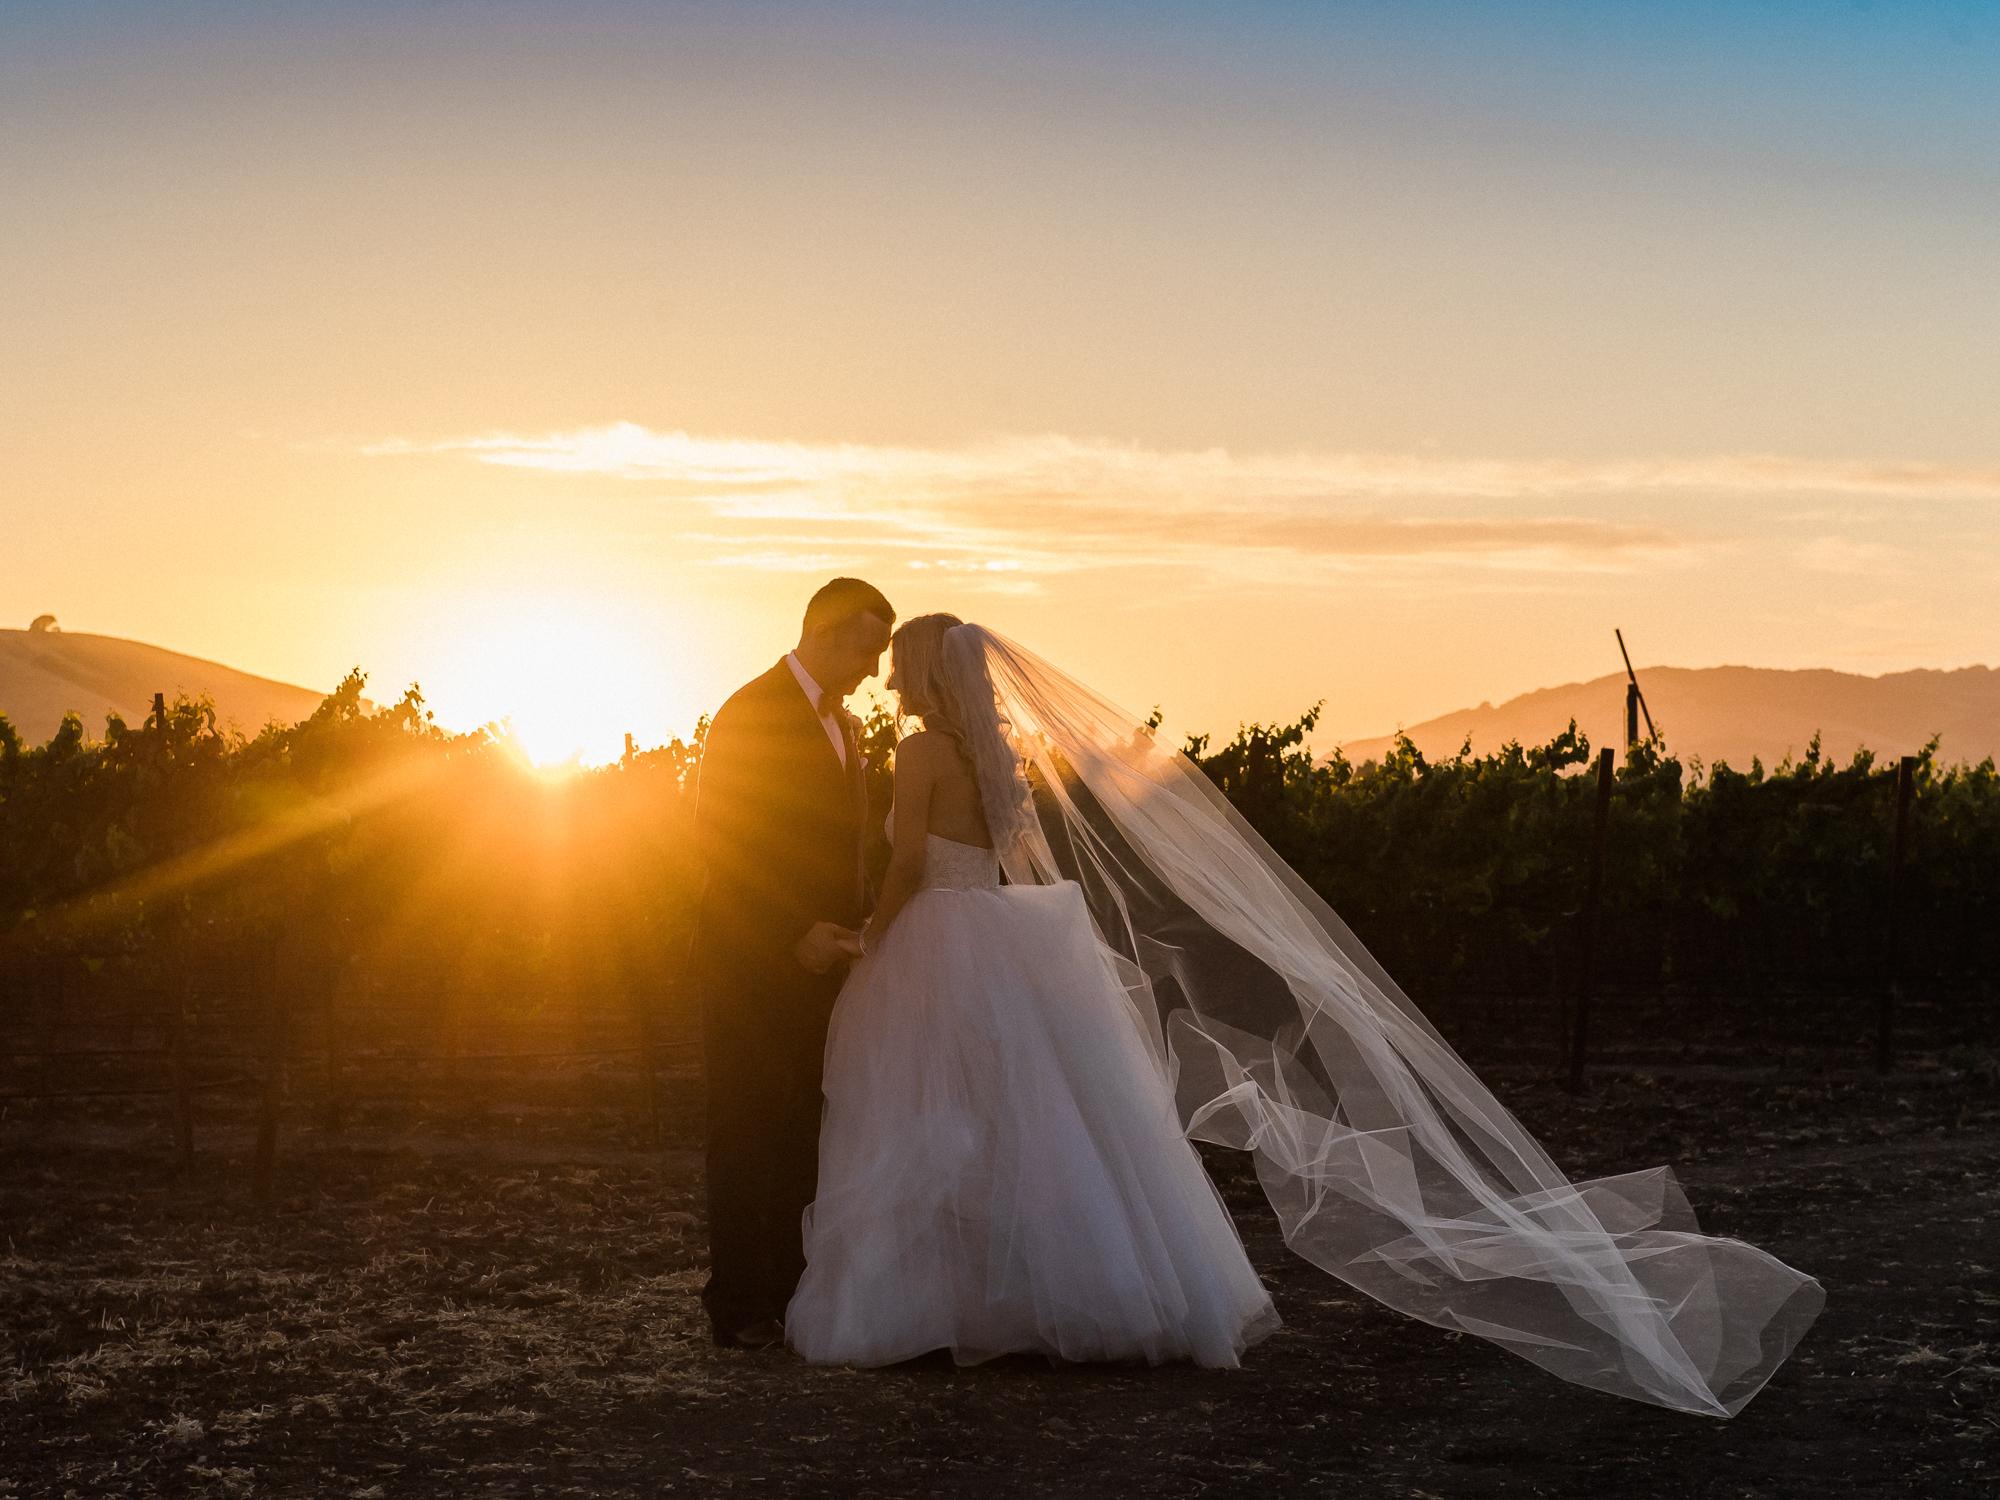 Aimee+Logan_wedding_spp-131.jpg